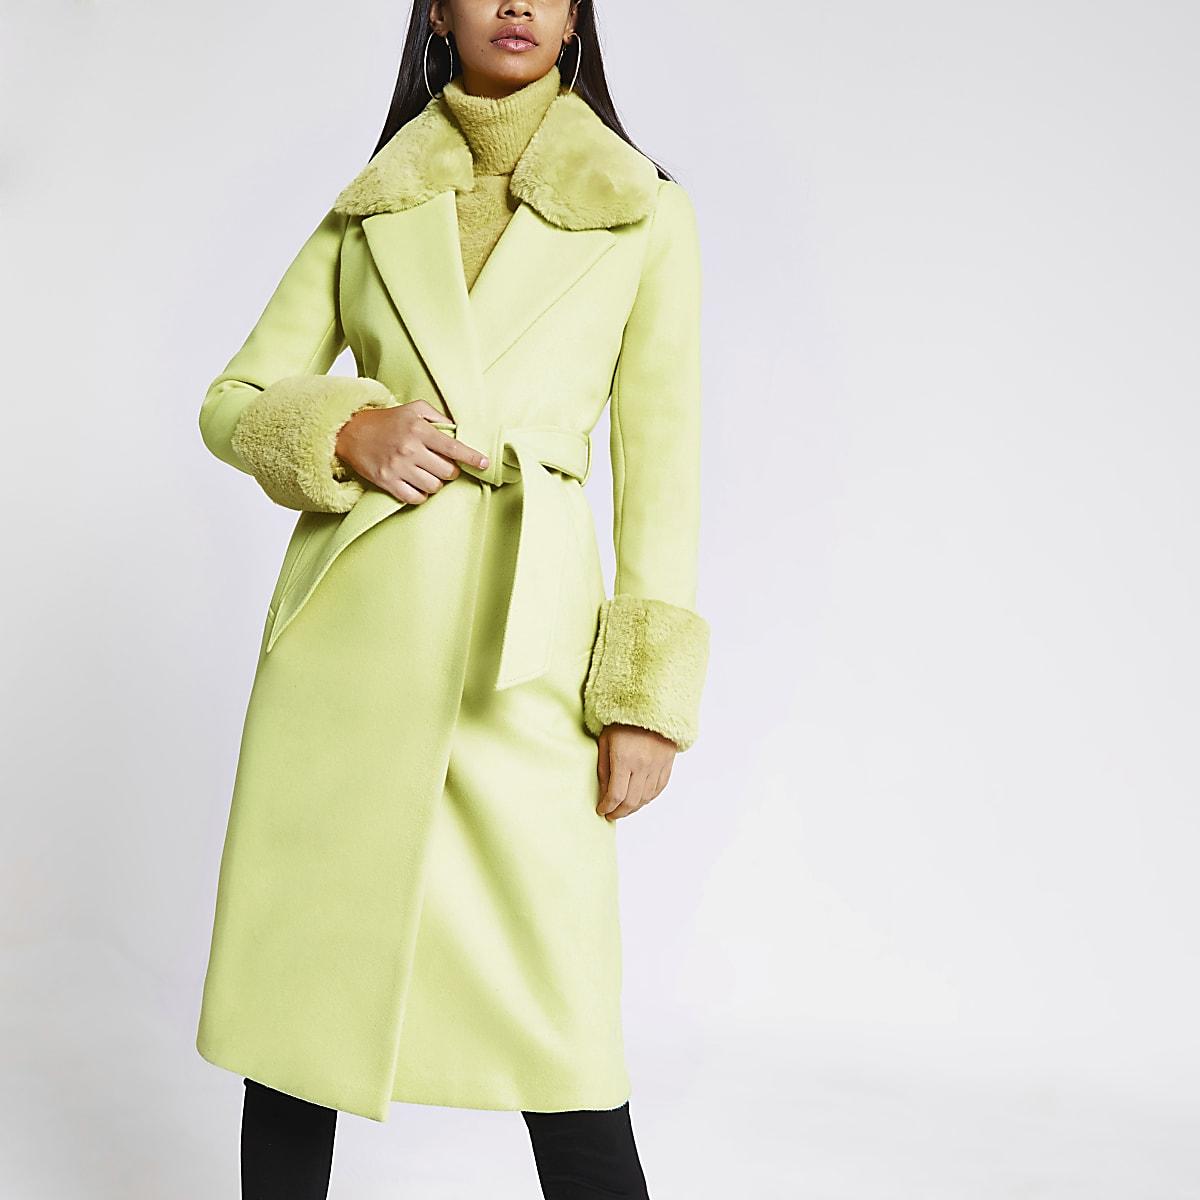 Limoenkleurige jas met strikceintuur en kraag van imitatiebont